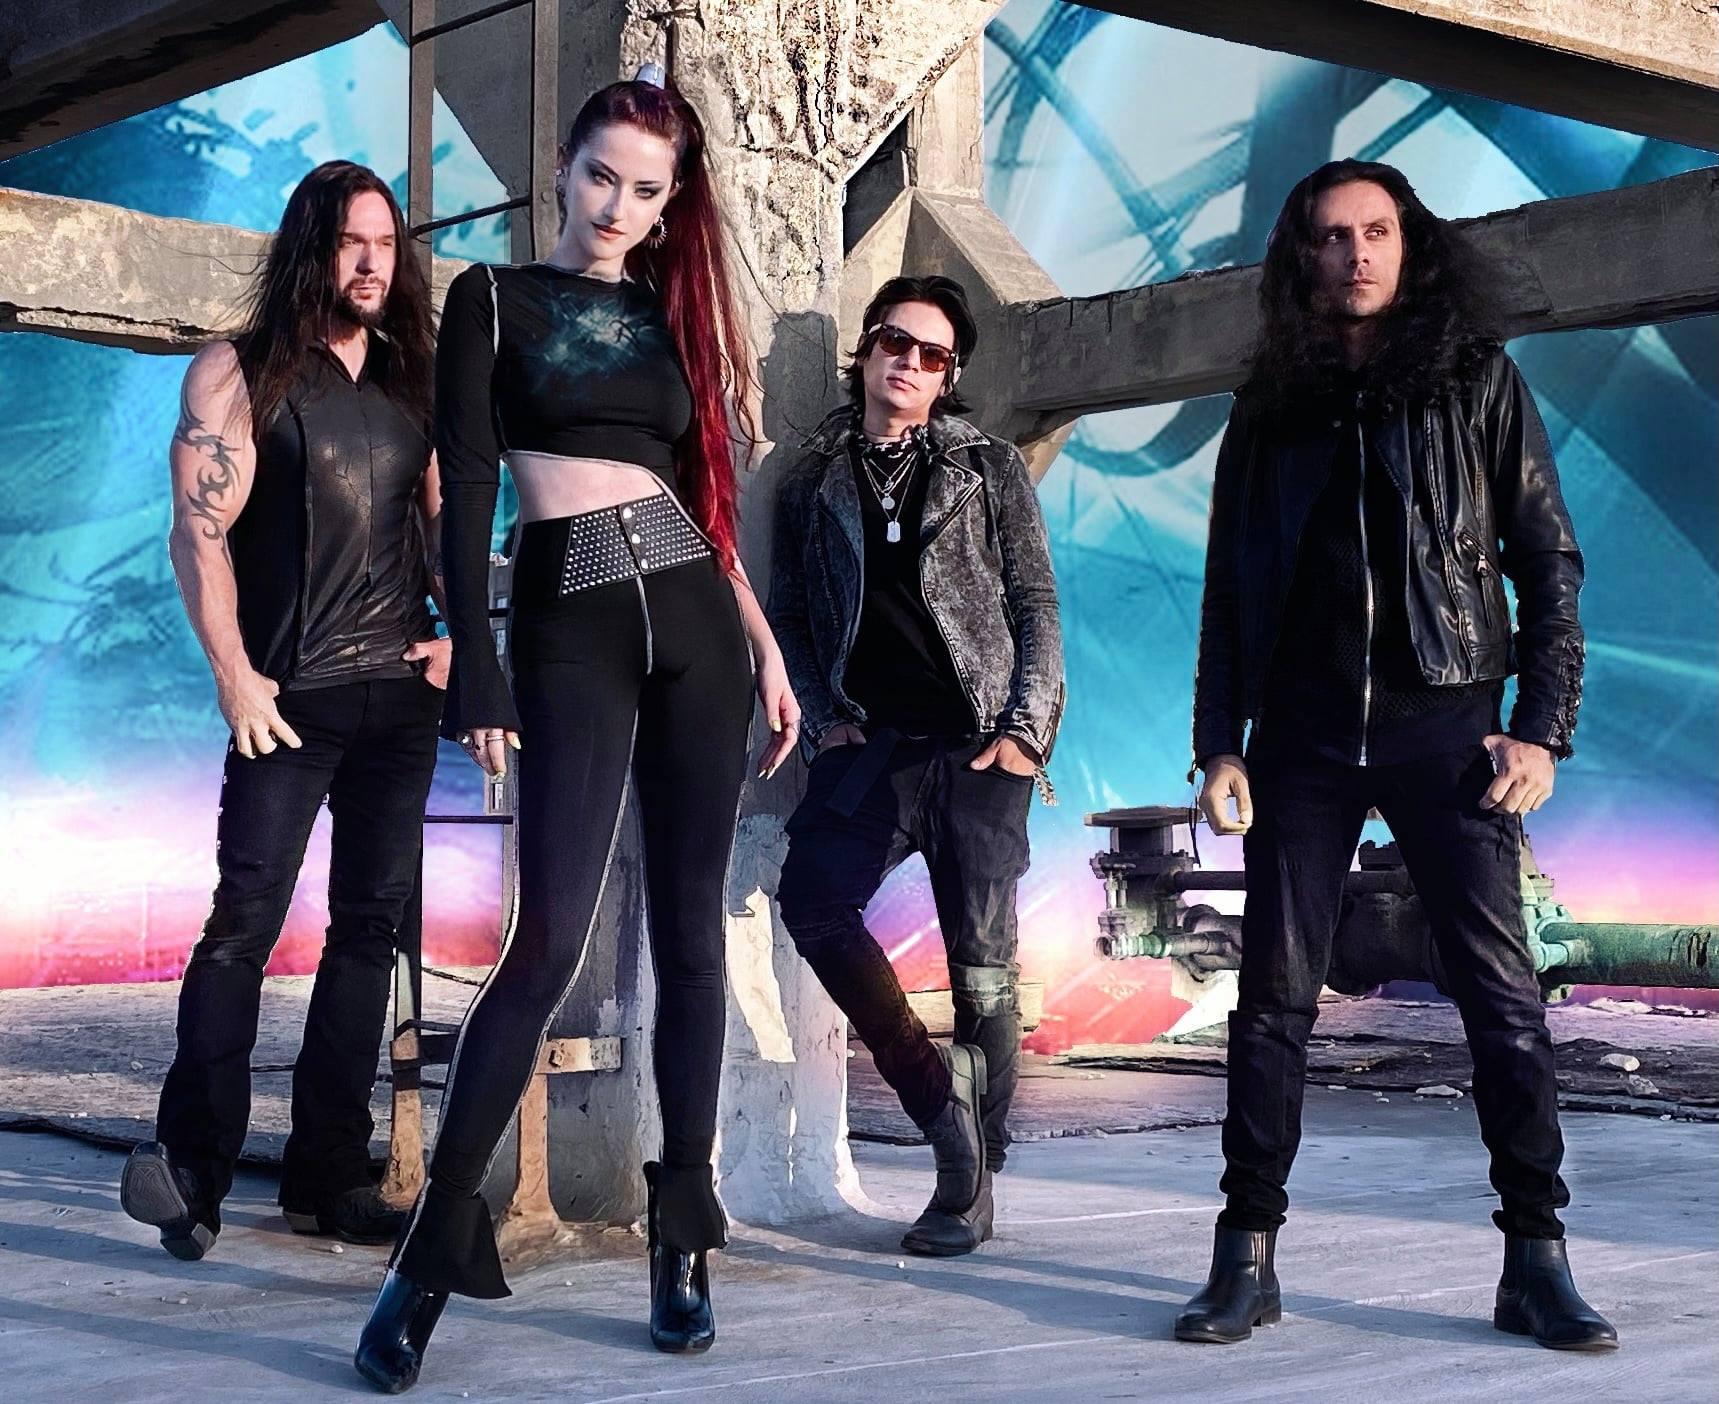 Edge of Paradise Heavy Metal LegendsKAM7162021